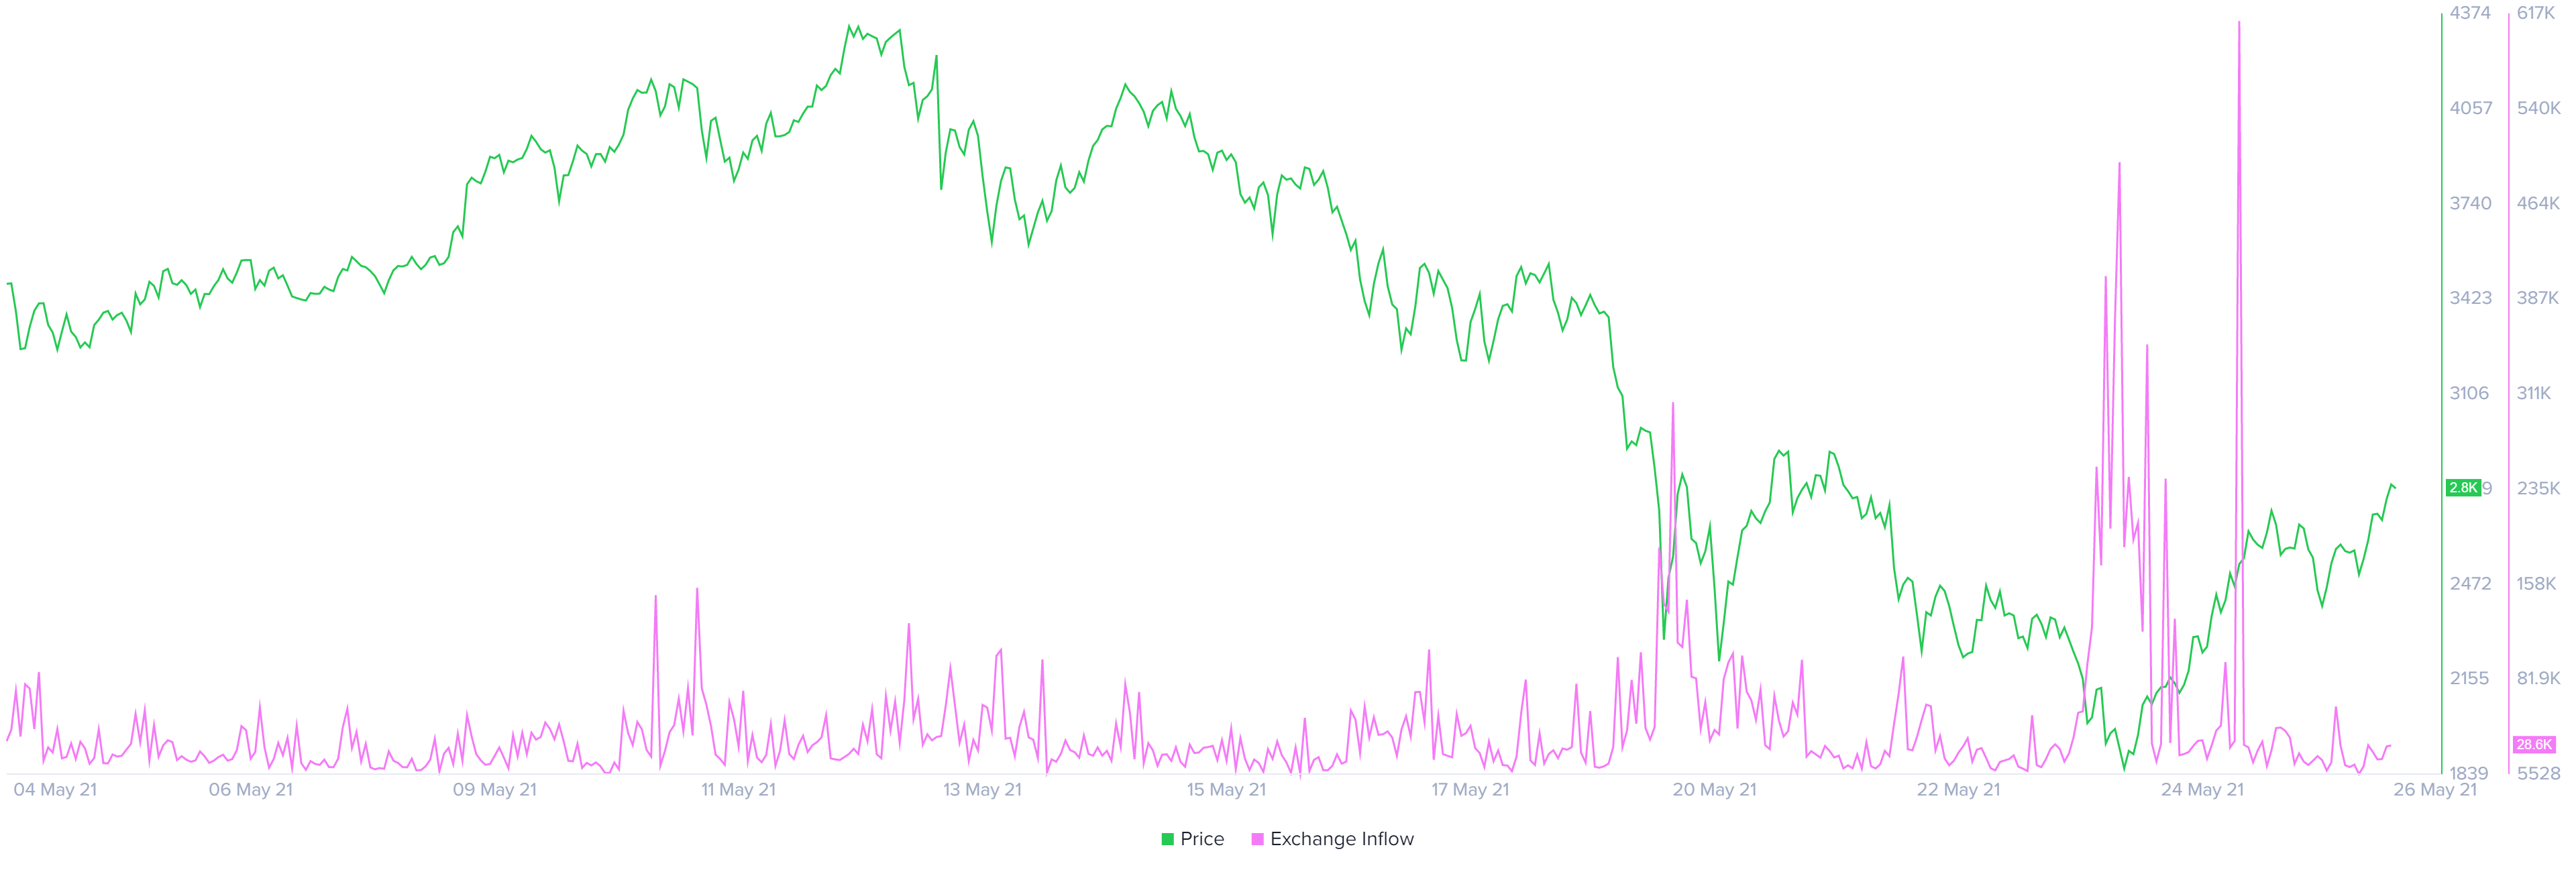 График предложения ETH на биржах